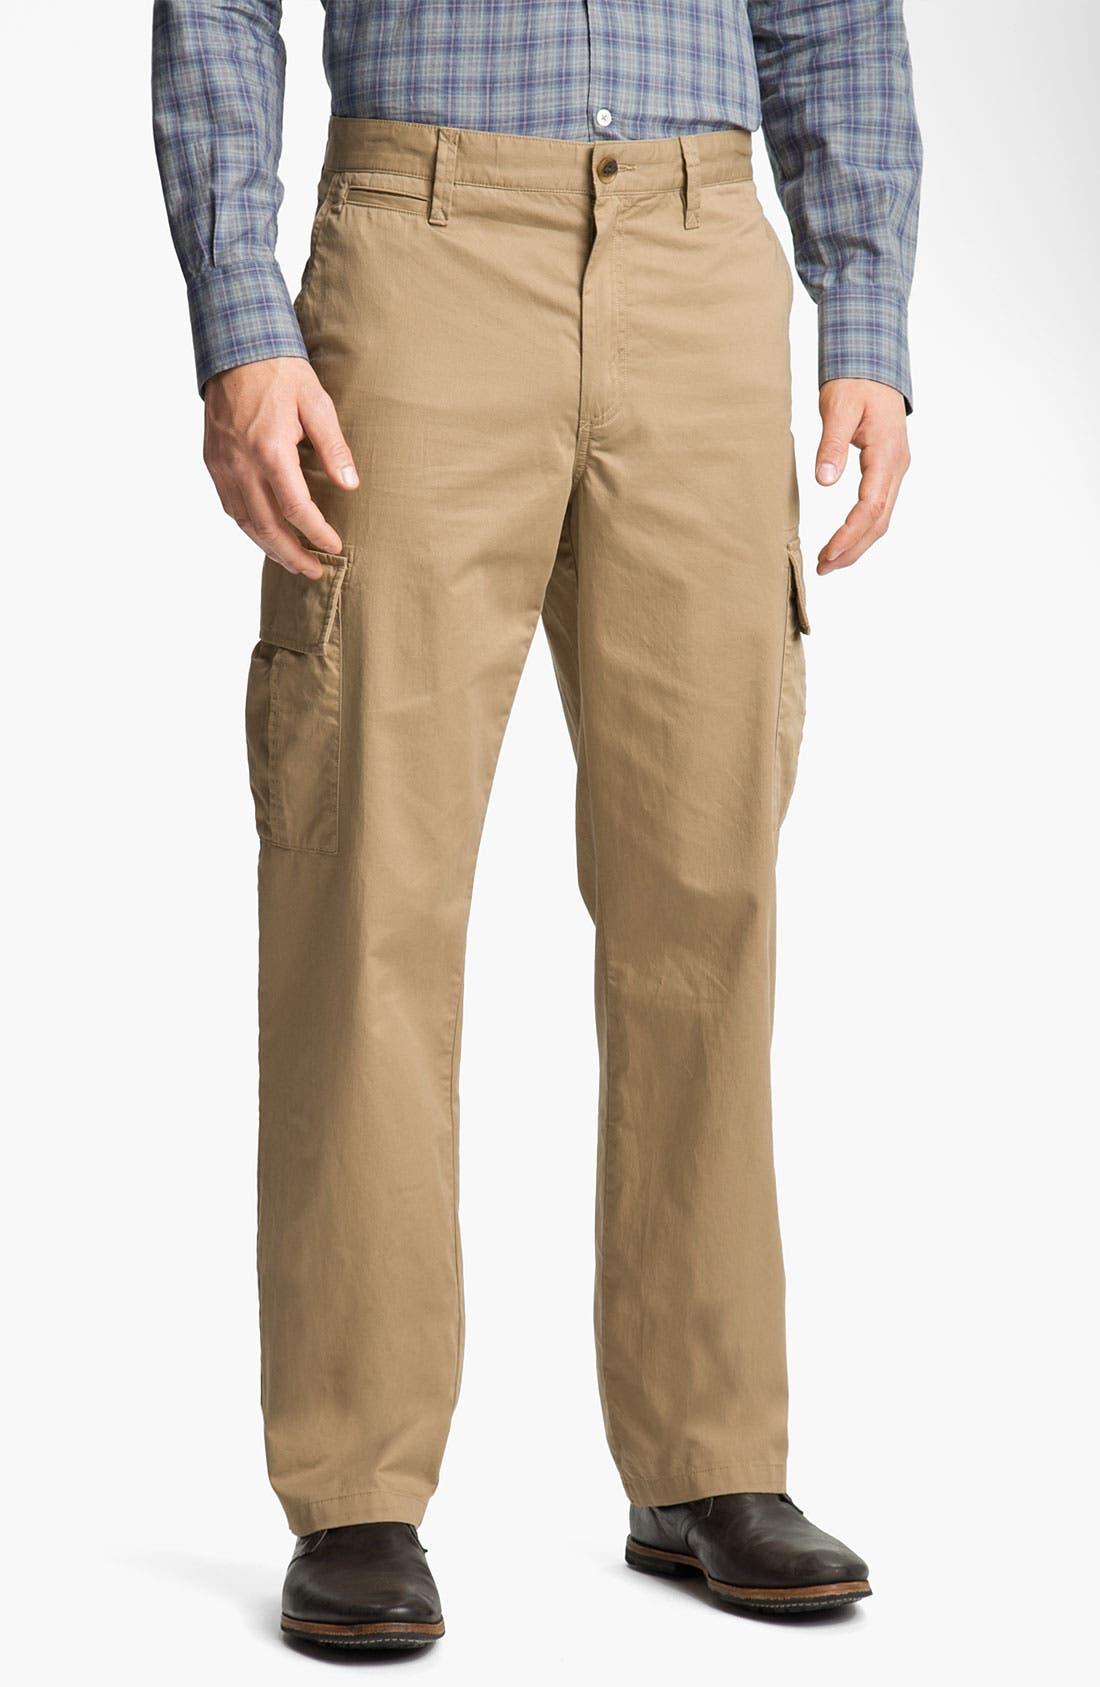 Main Image - Wallin & Bros. 'Fulham' Cargo Pants